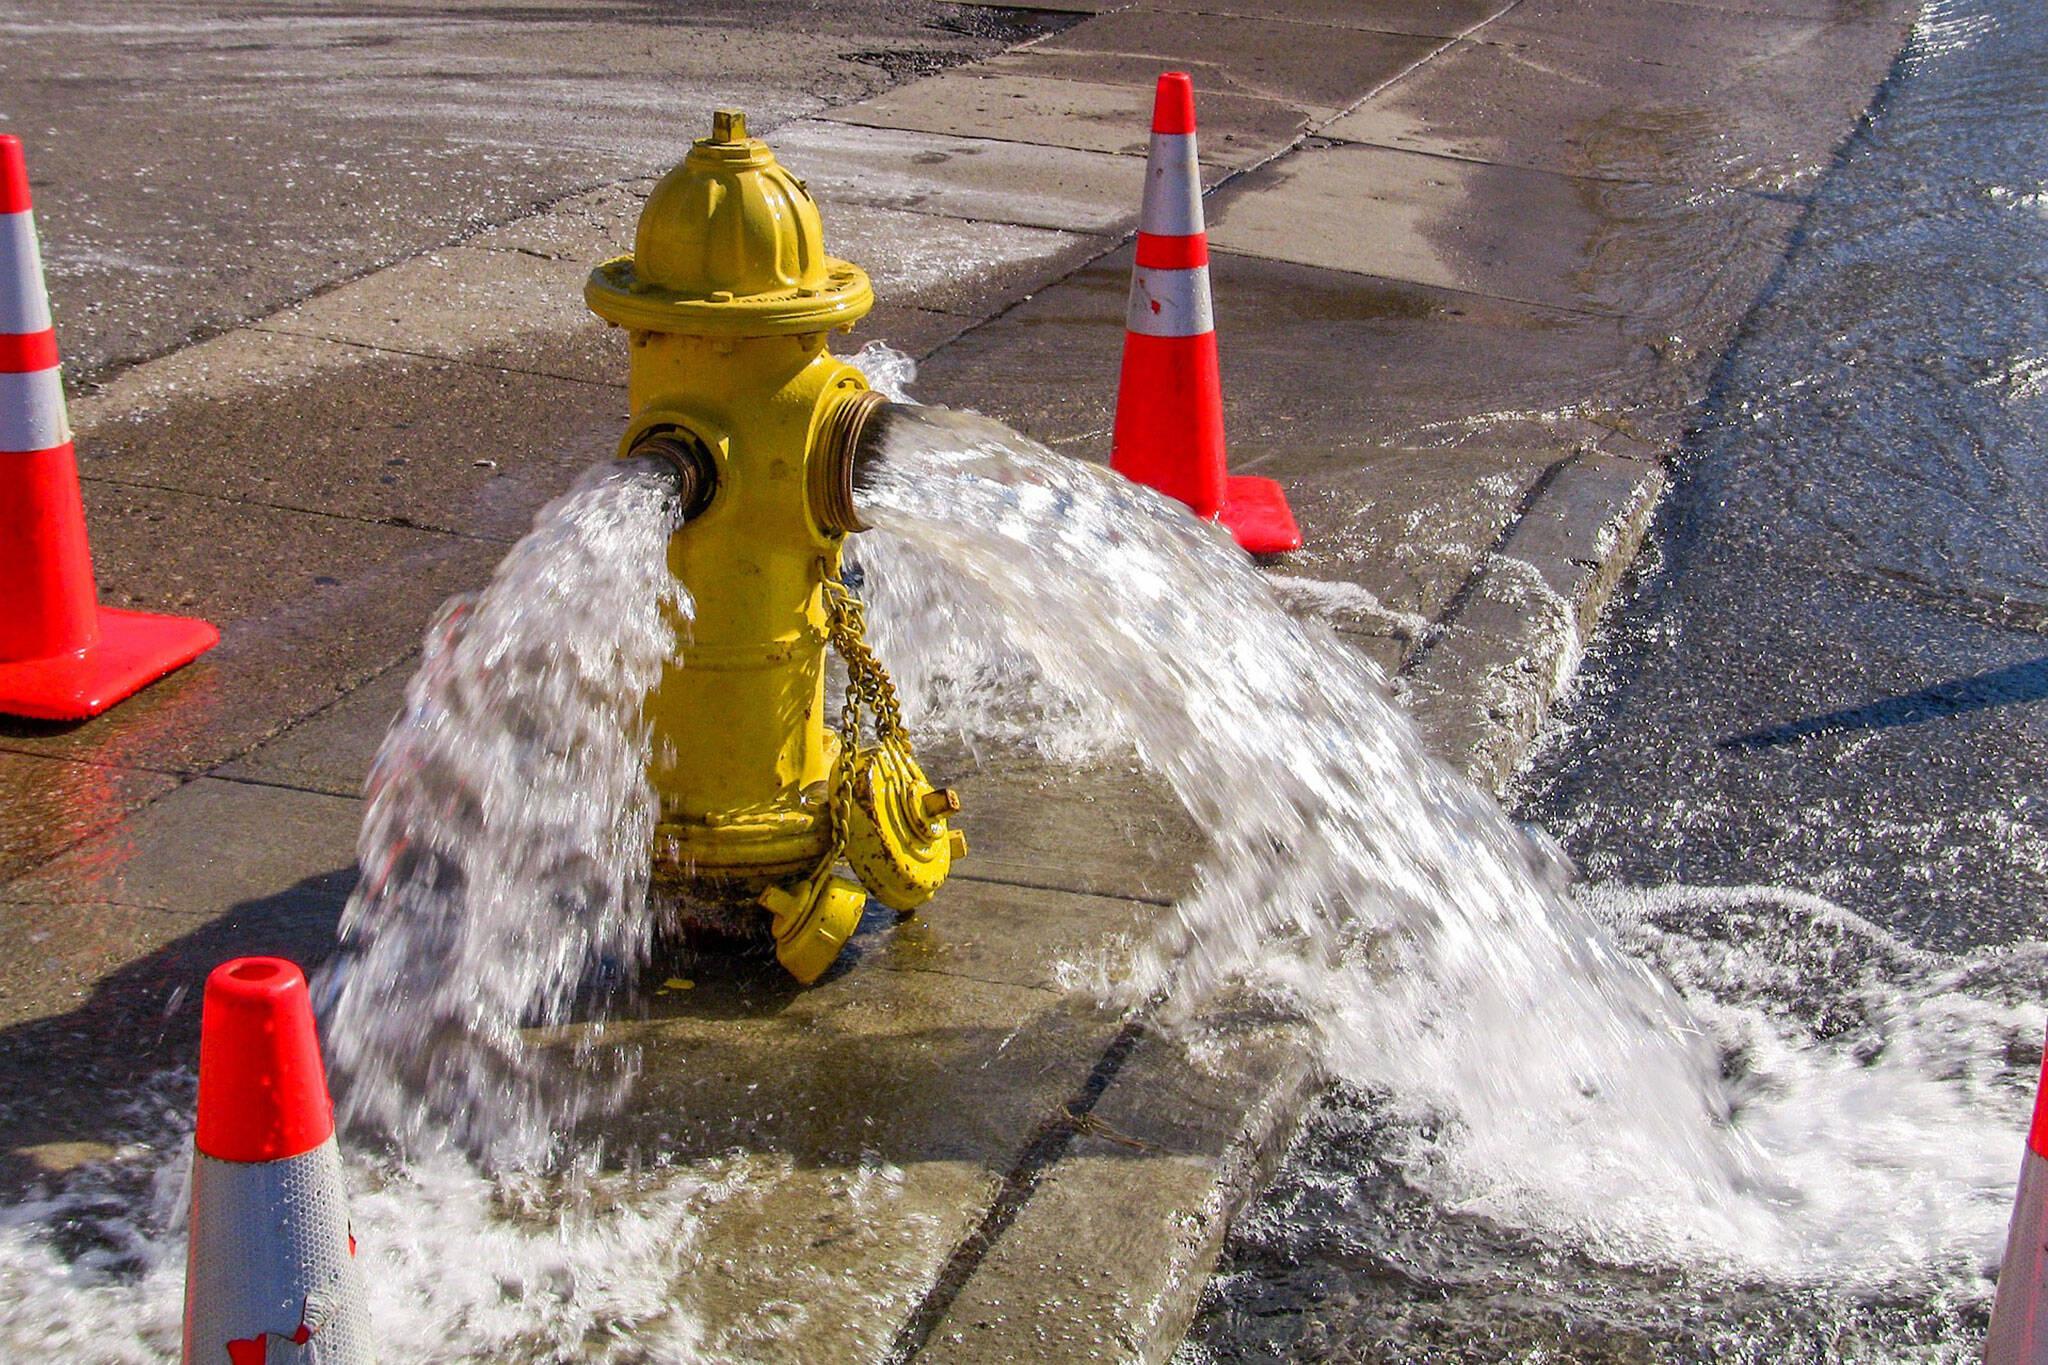 311 fire hydrant toronto